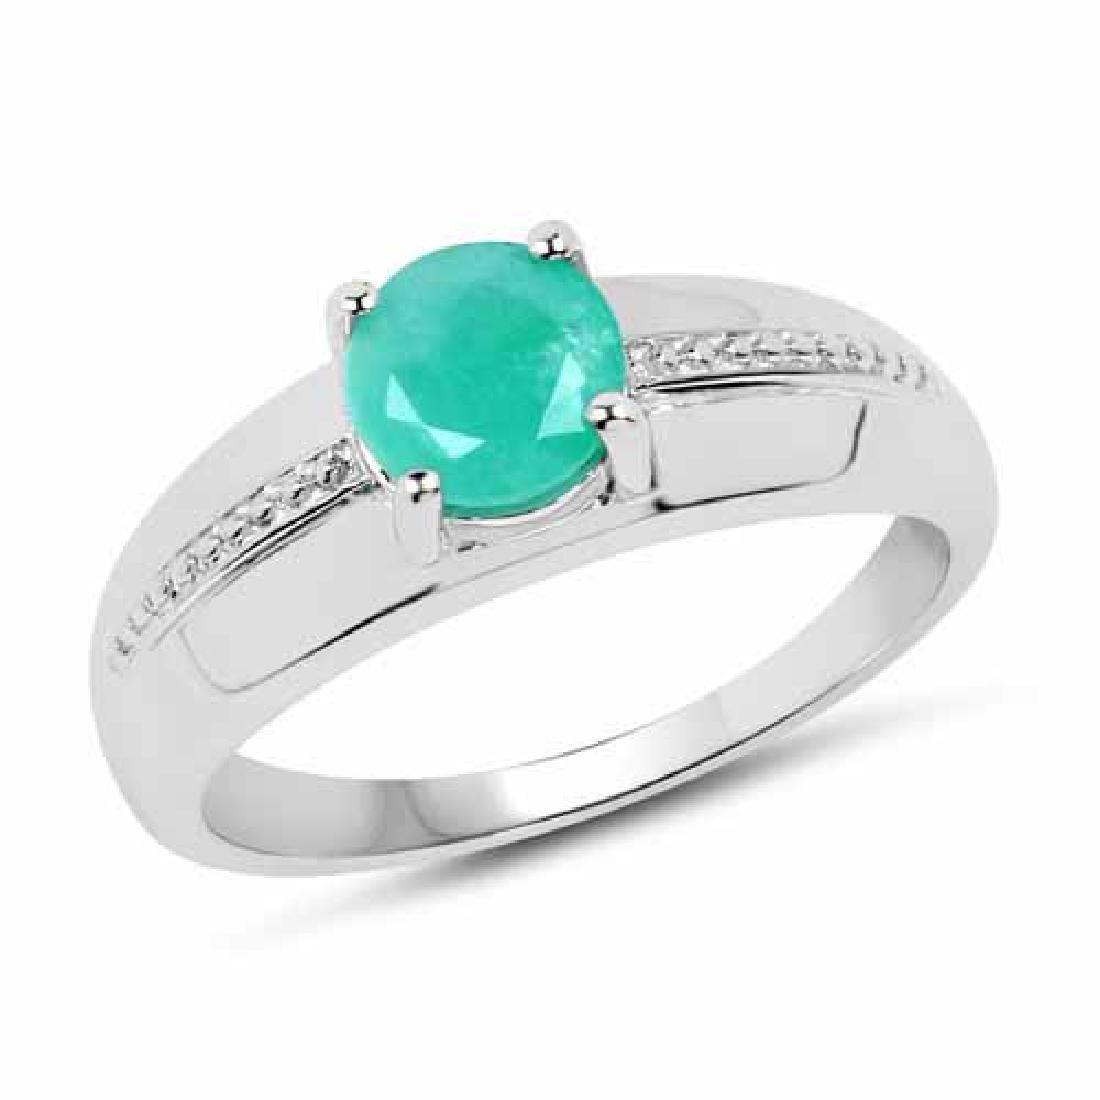 0.75 Carat Genuine Emerald .925 Sterling Silver Ring